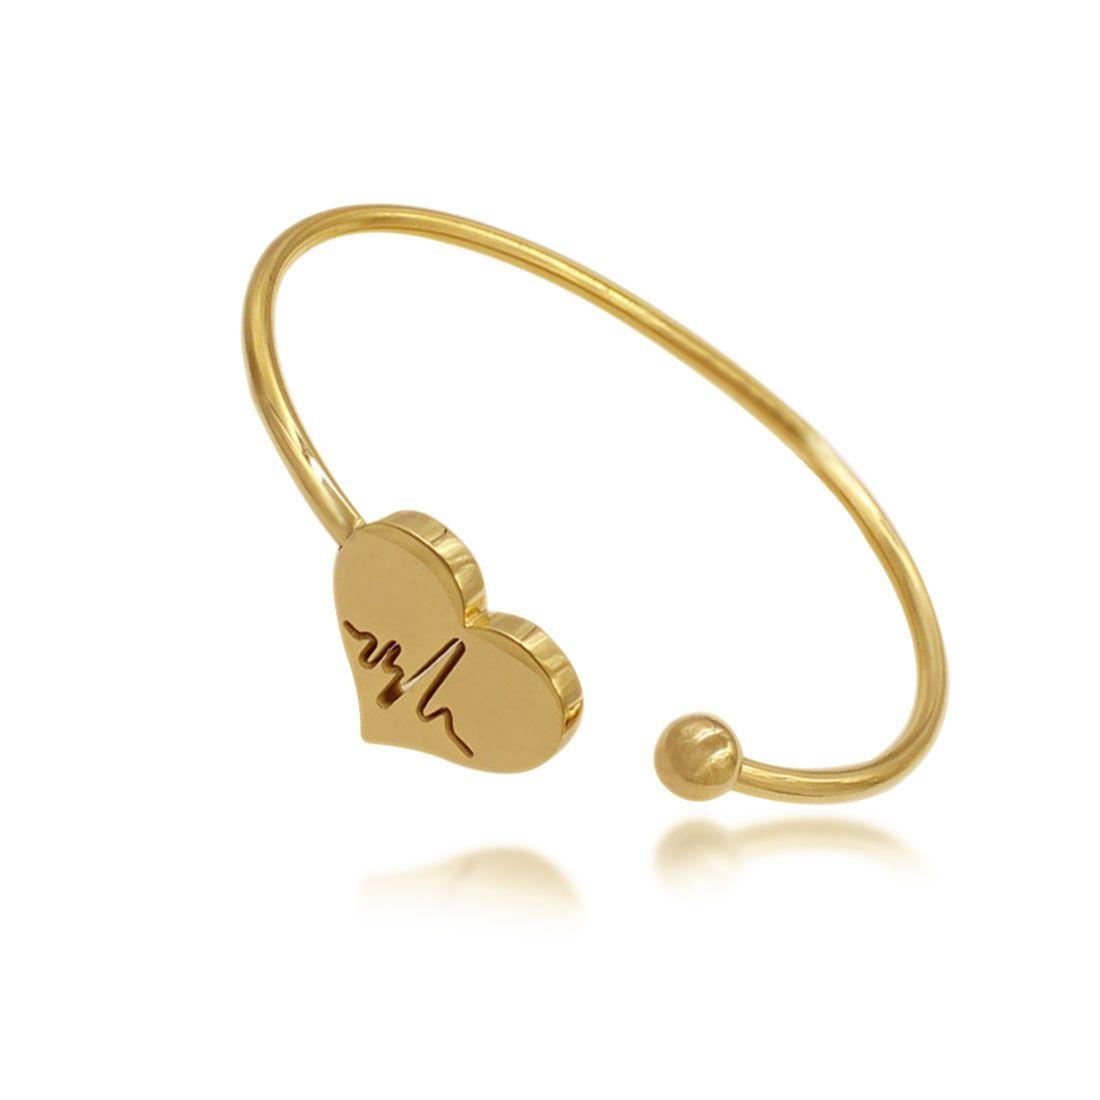 2017 Latest Fashion Heart Charms Gold Bracelet For Women